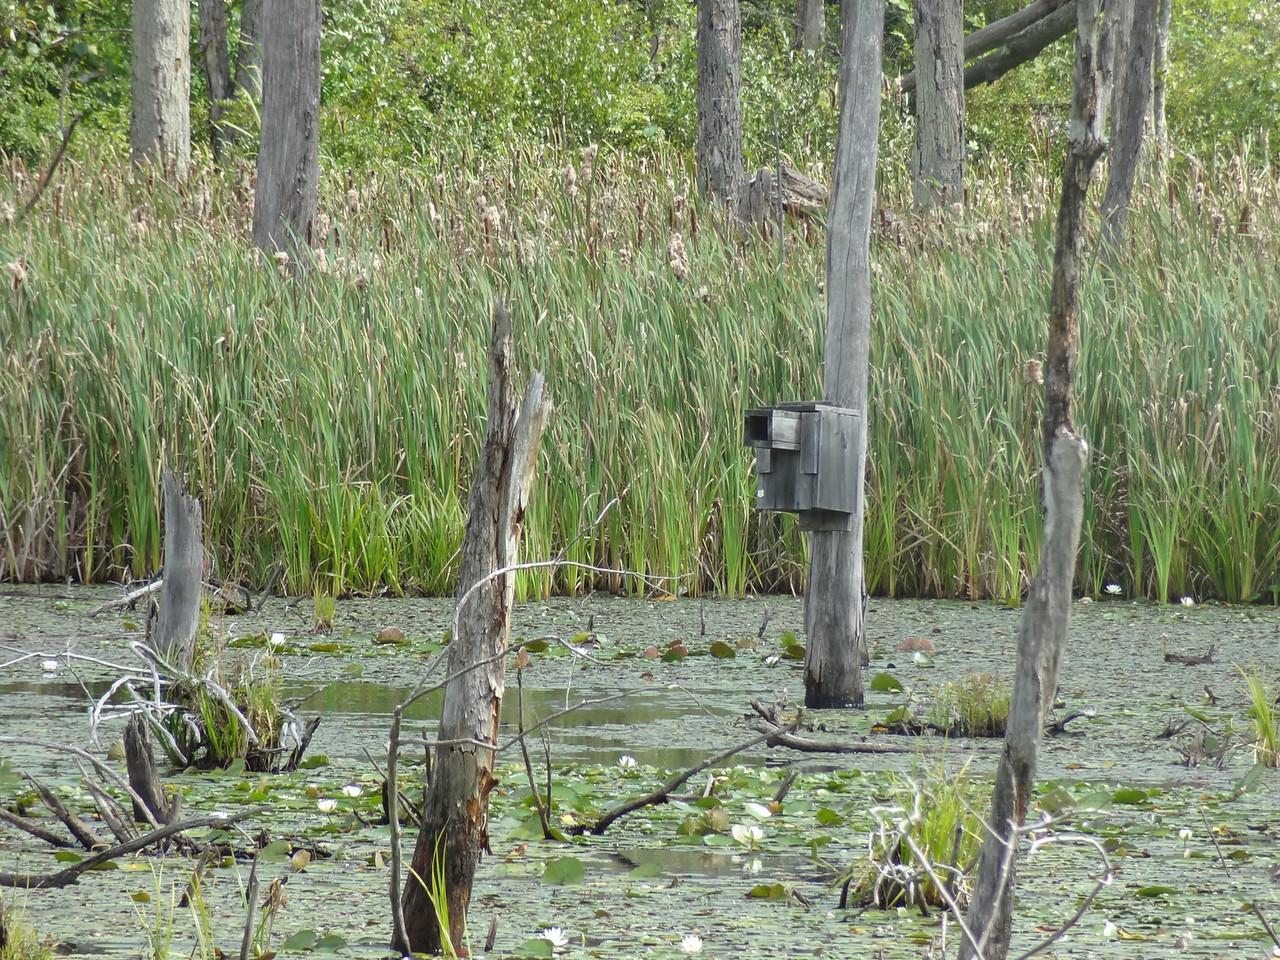 A wood duck nesting box.